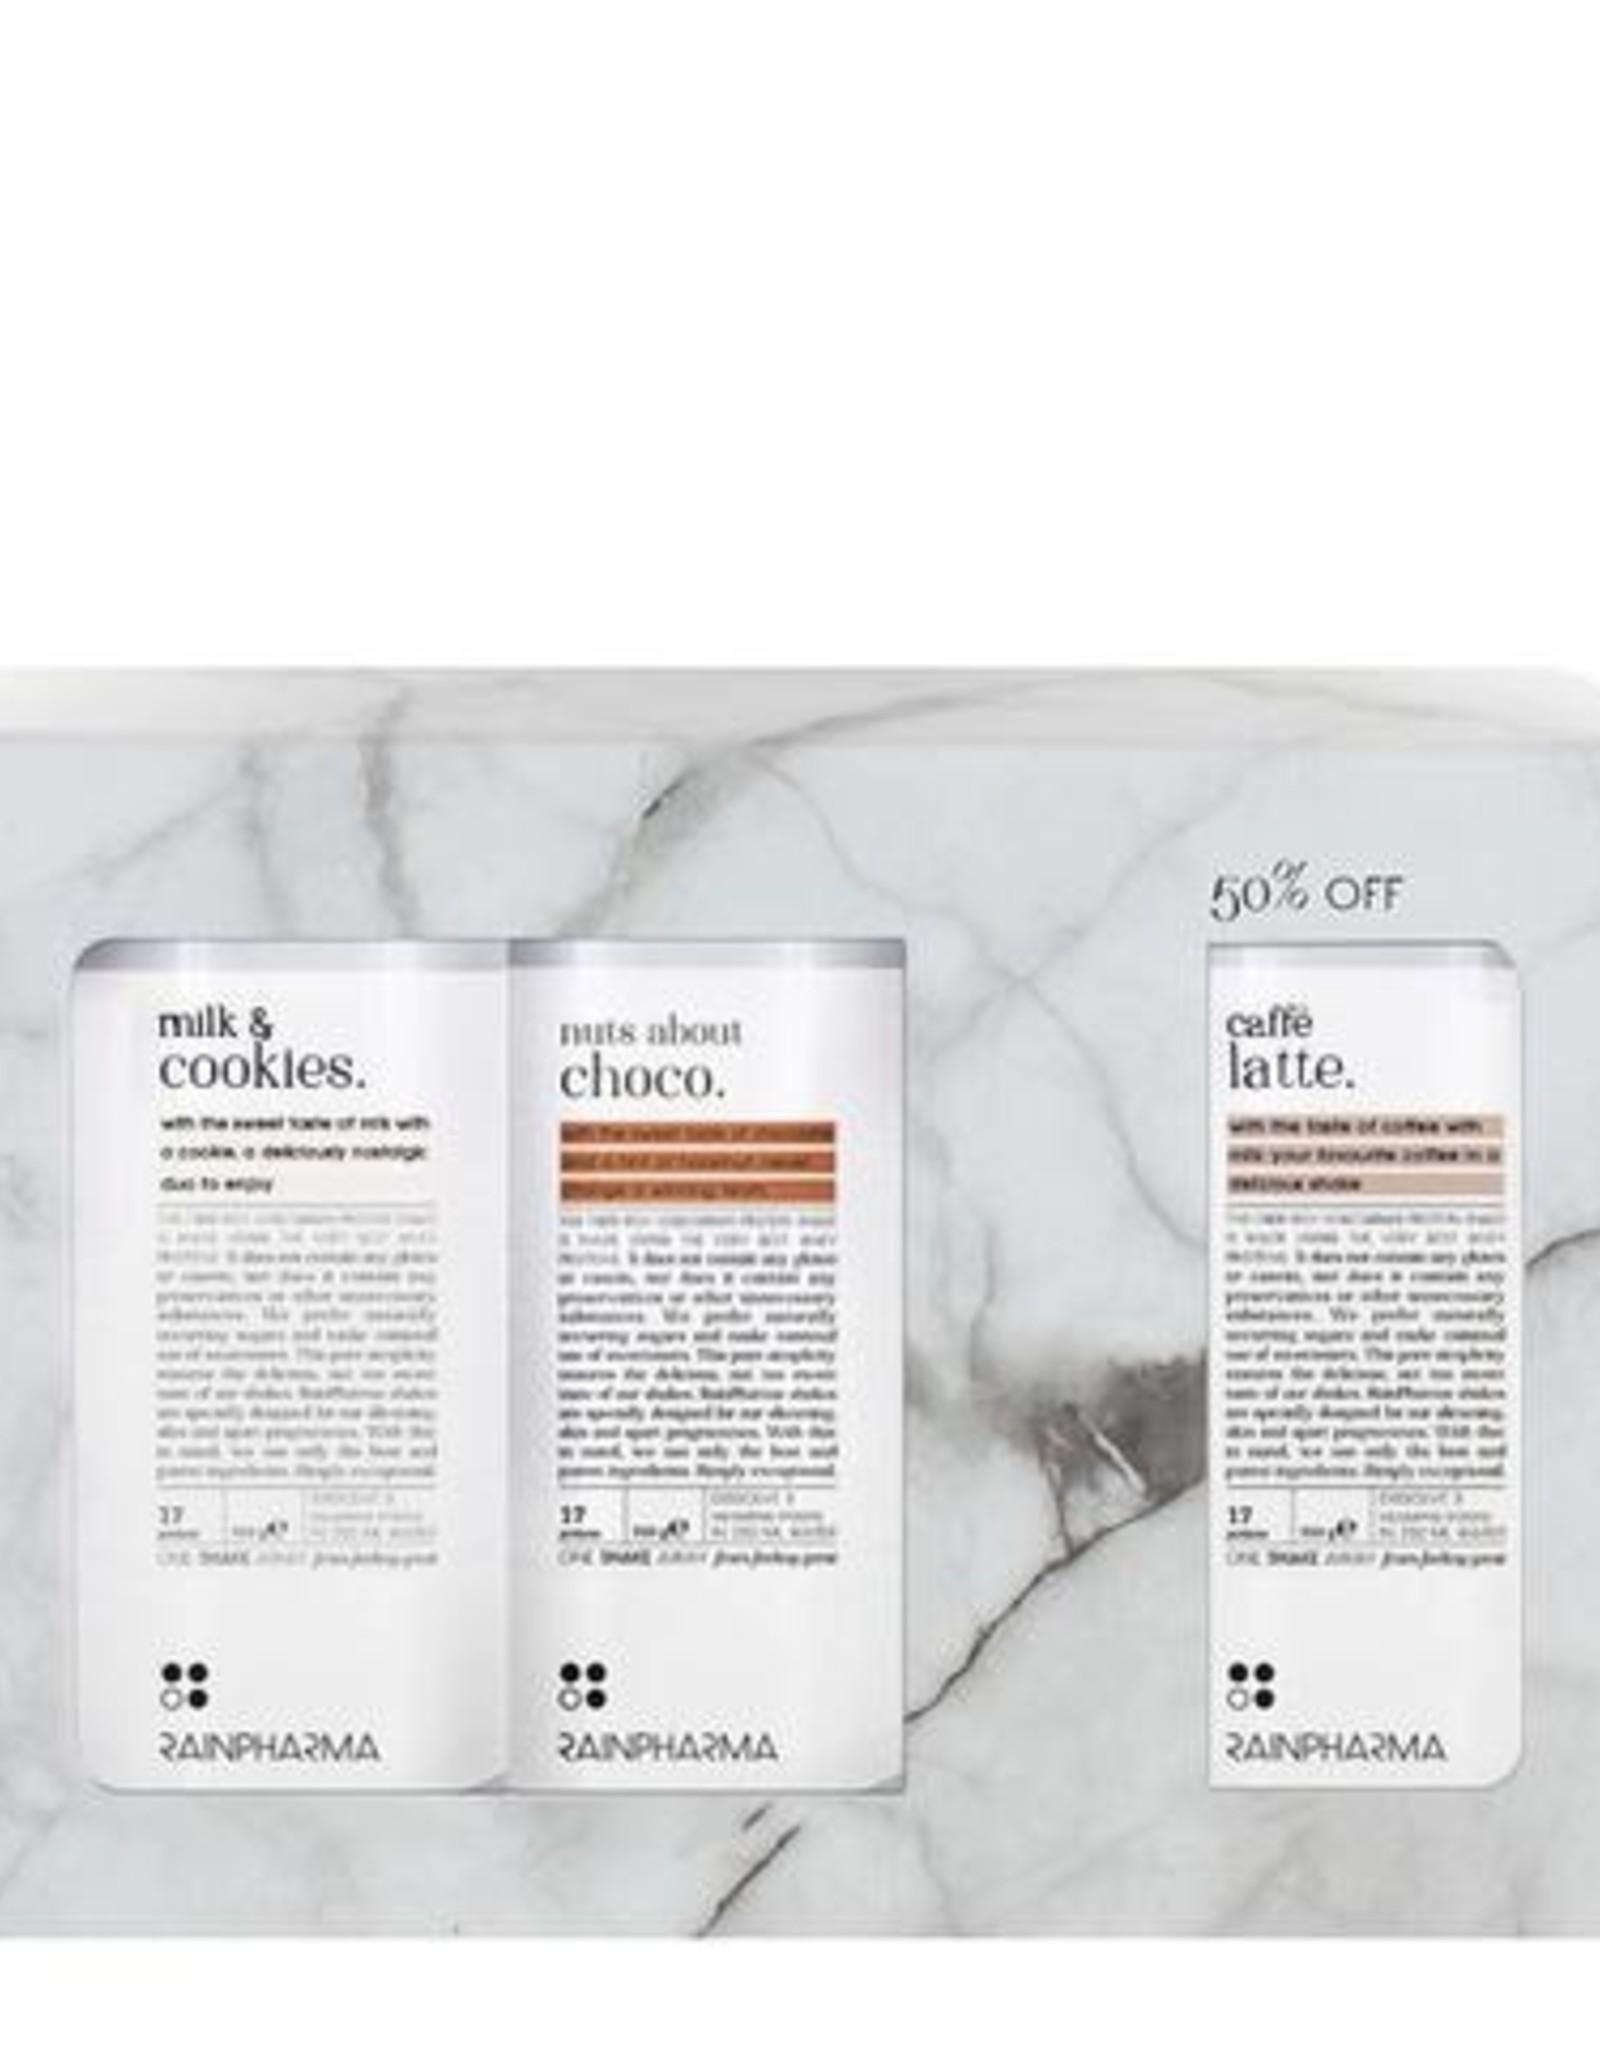 RainPharma Rainpharma - Trio Shakes - Milk&Cookies, Nuts About Choco, Caffé Latté